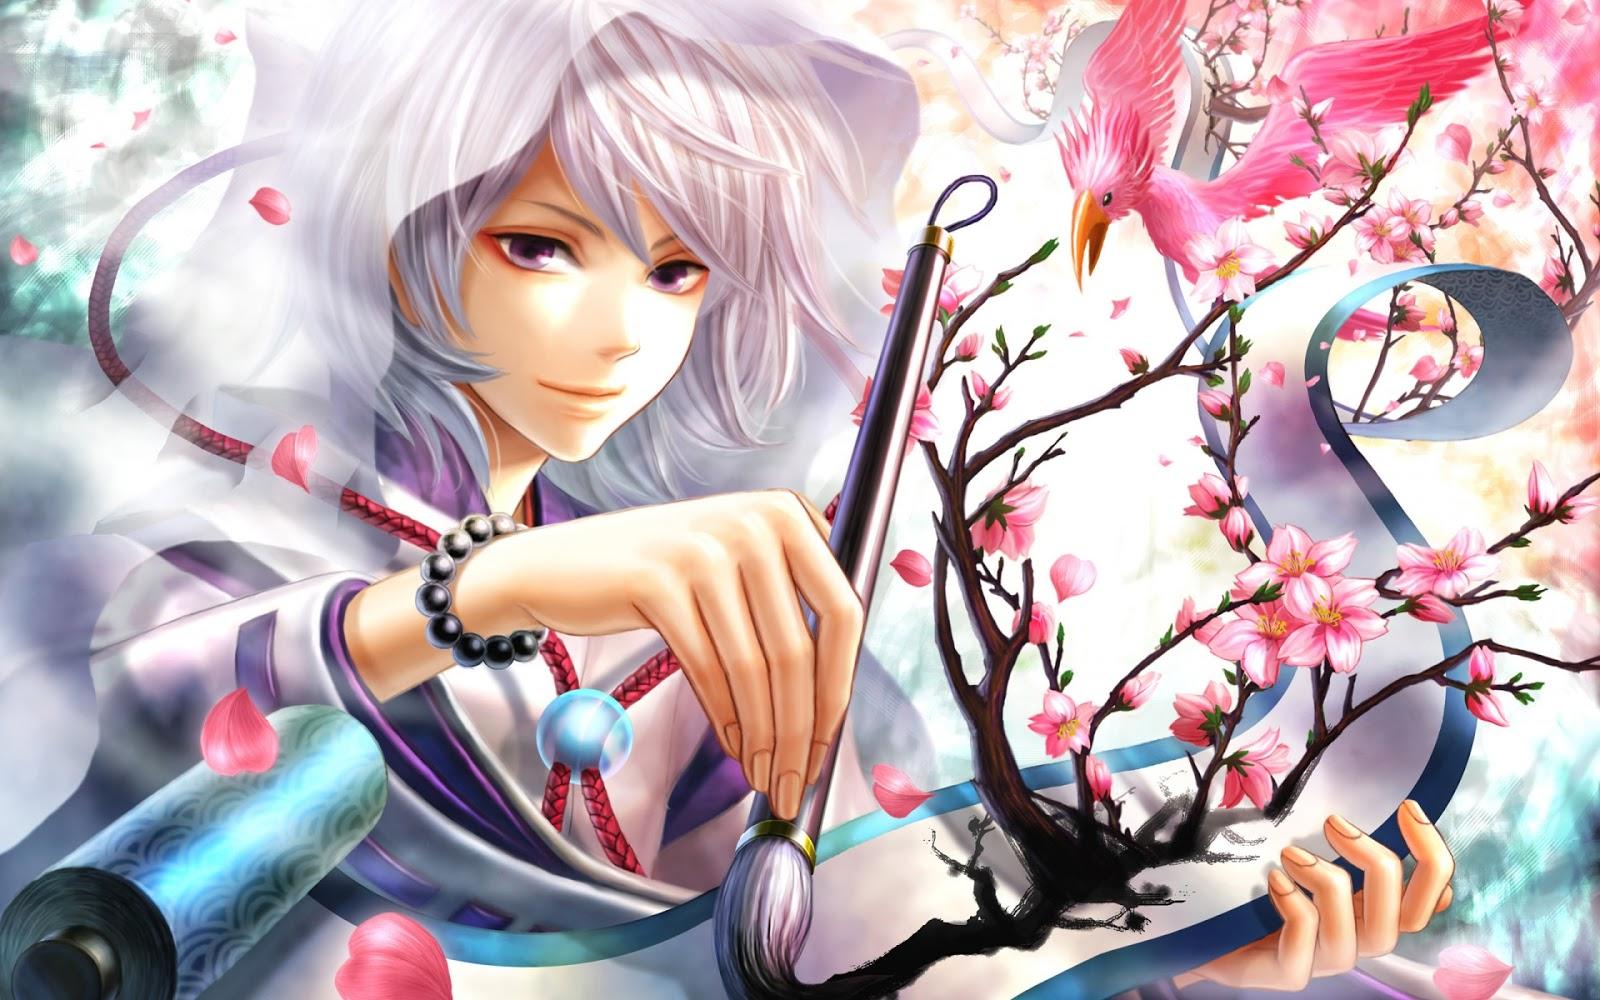 Cute Guy Artist Painting Flowers White Hair Anime HD Wallpaper Desktop 1600x1000